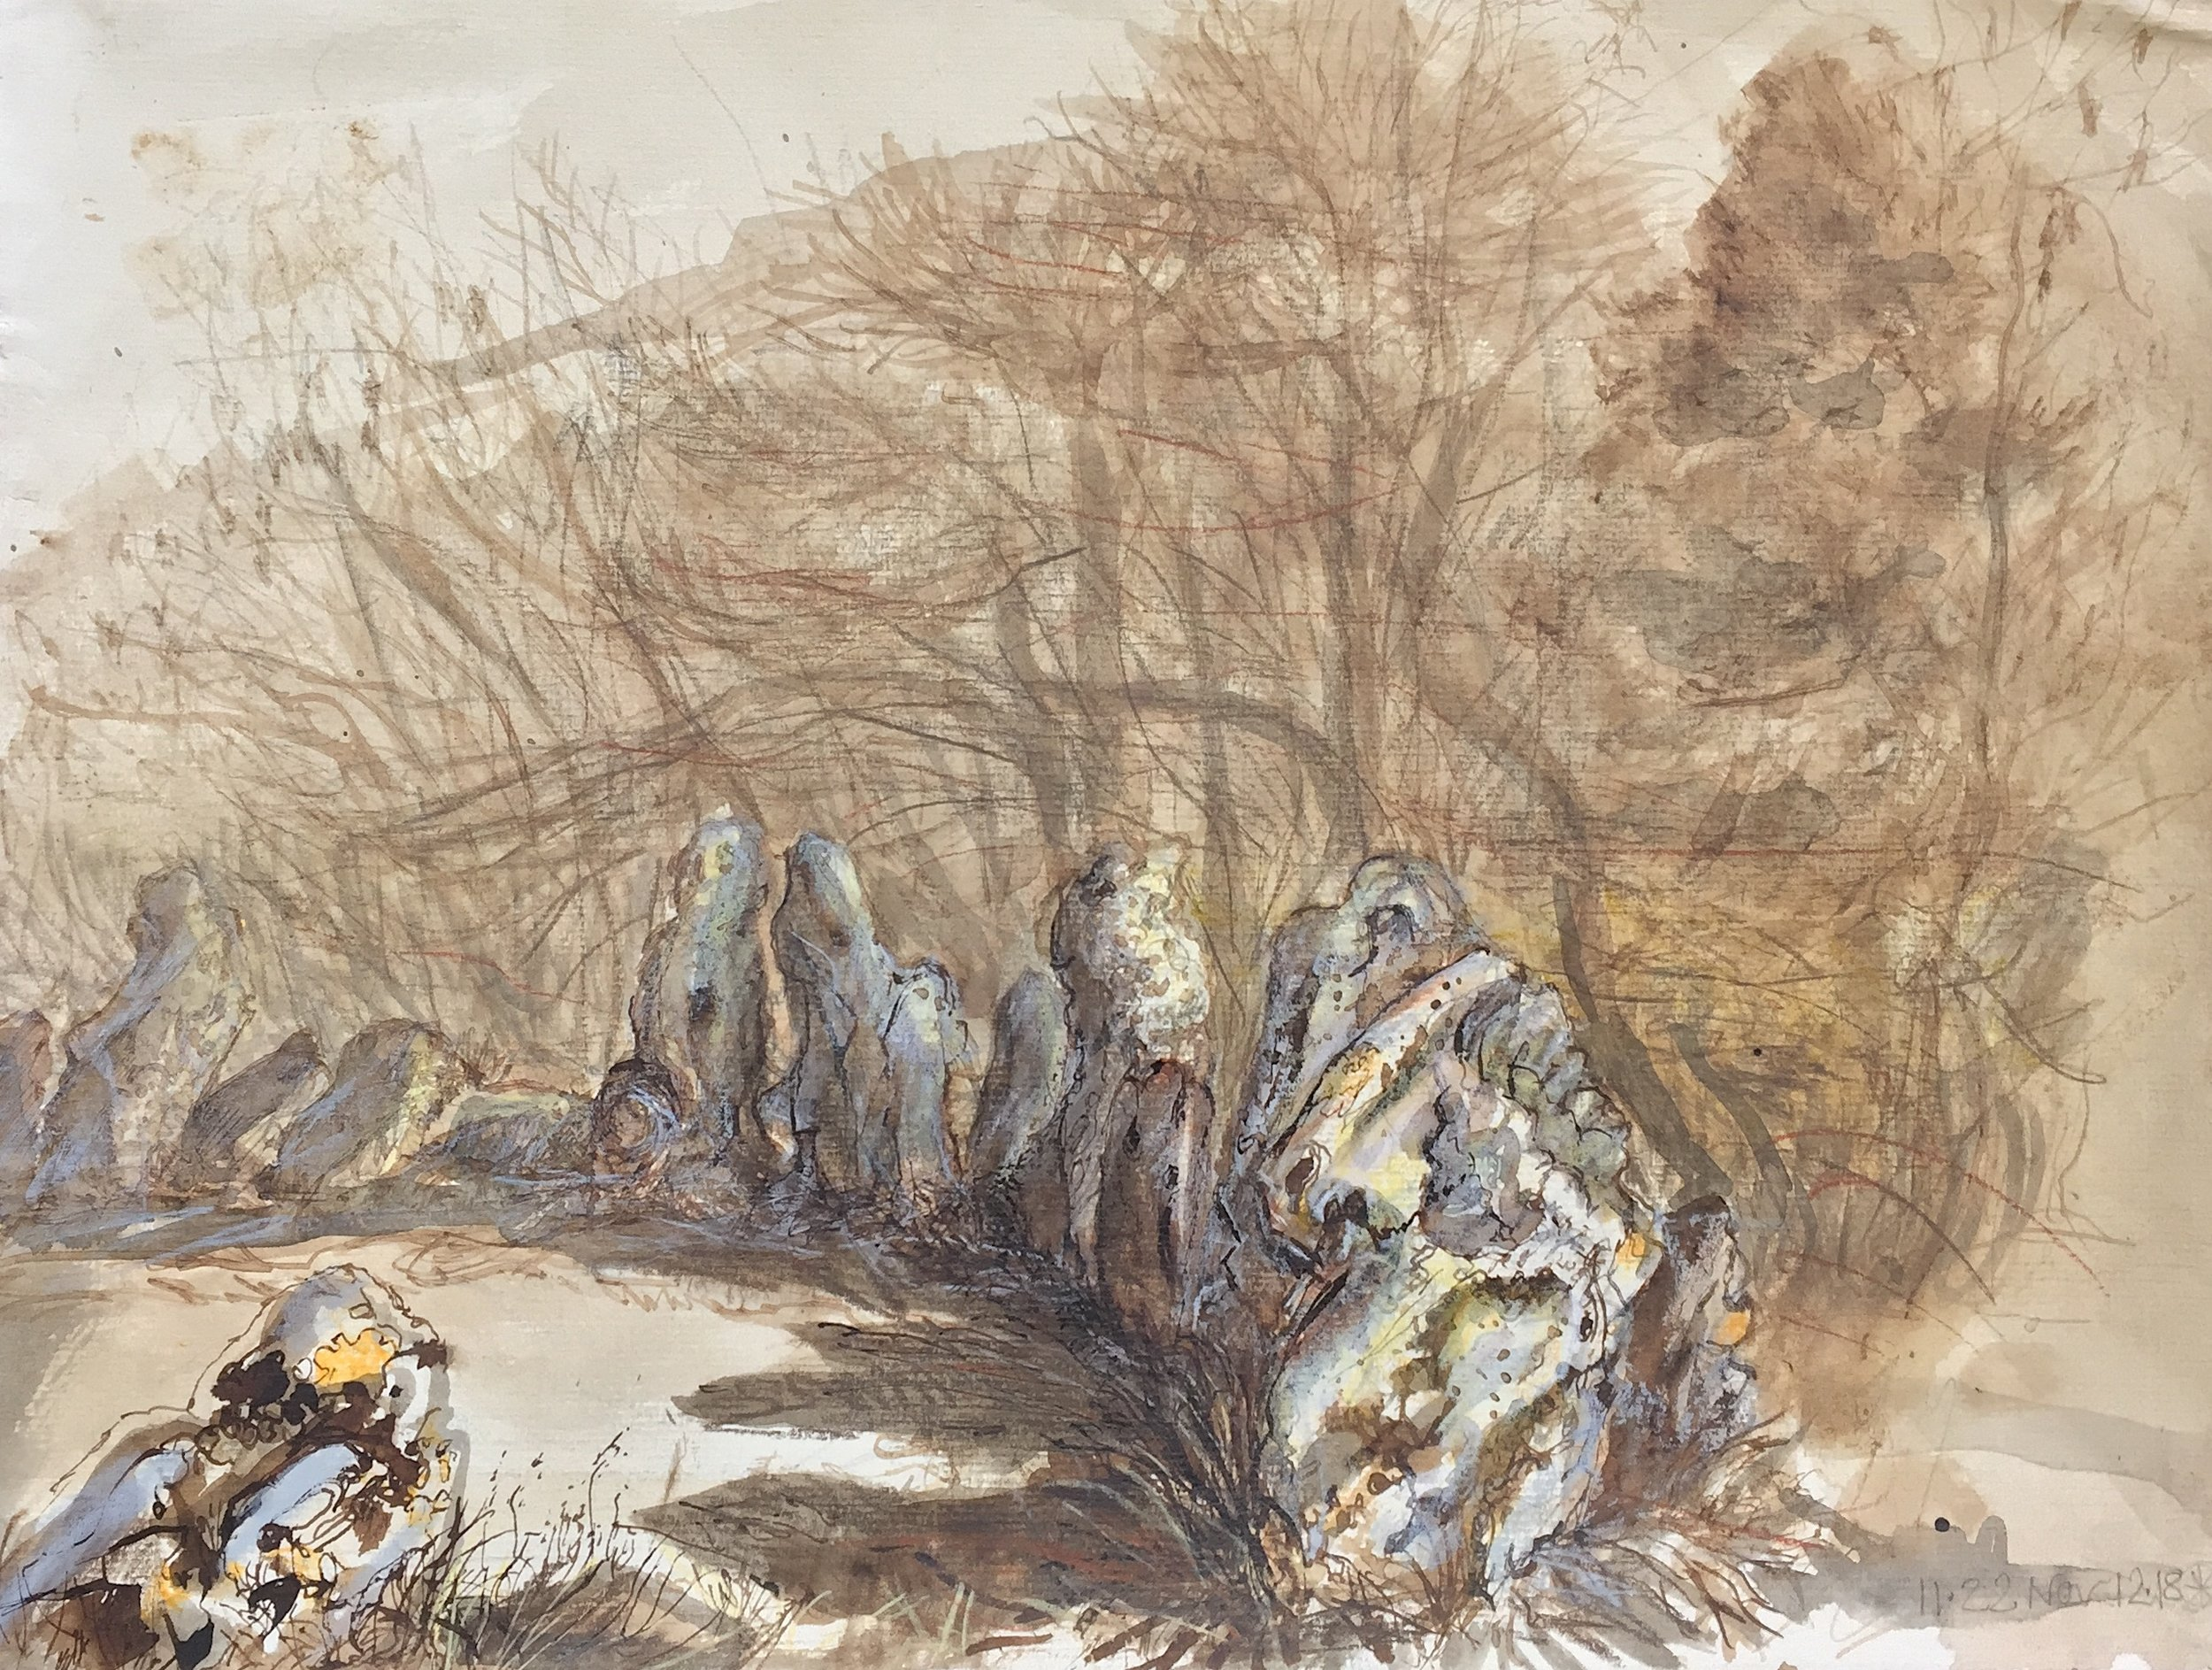 Larix, Pinus Sylvestris and Fraxinus - Feel the Stones